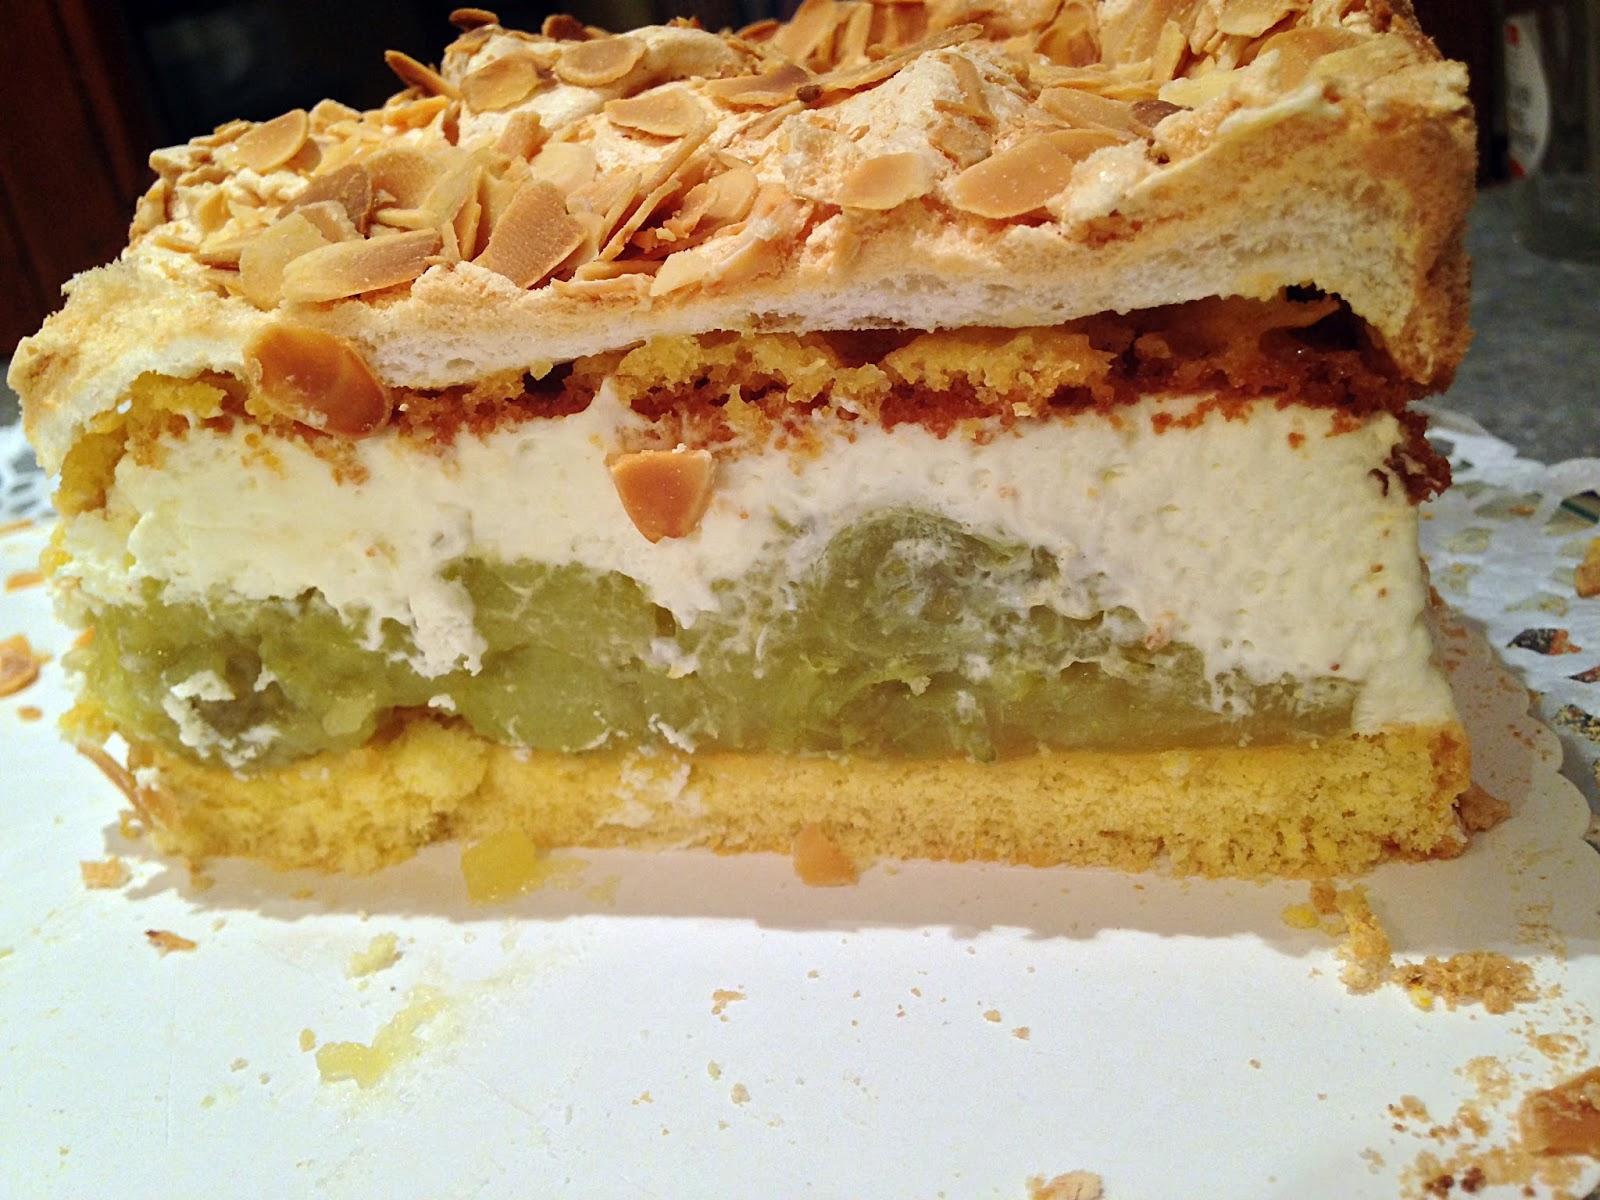 Backsucht Mamas Rezepte Teil 3 Stachelbeer Baiser Torte